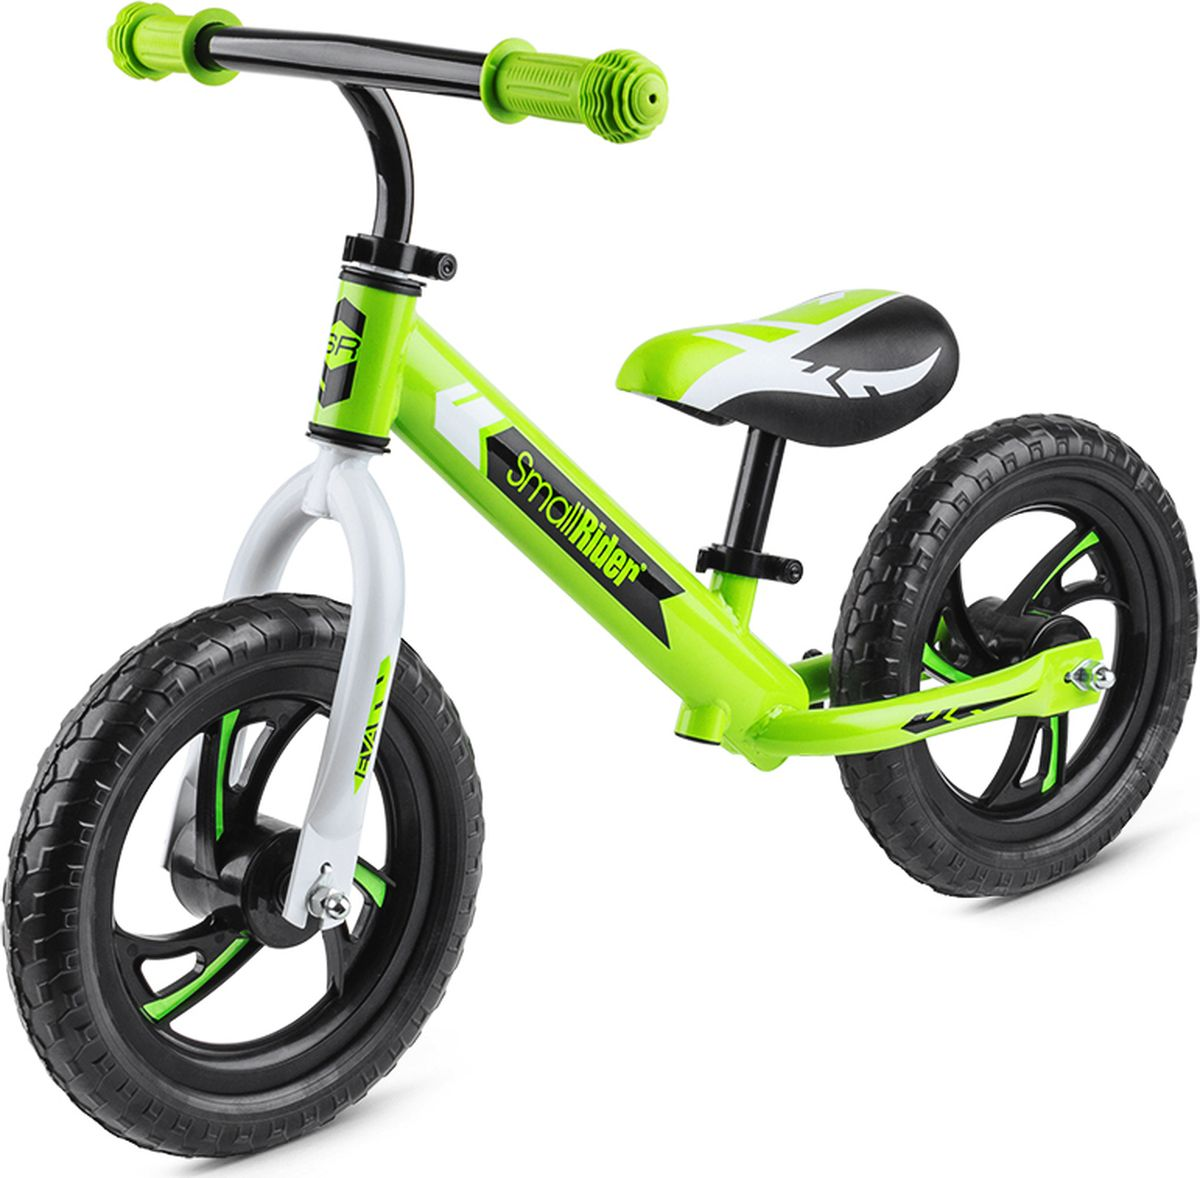 Small Rider Беговел детский Roadster цвет зеленый - Беговелы